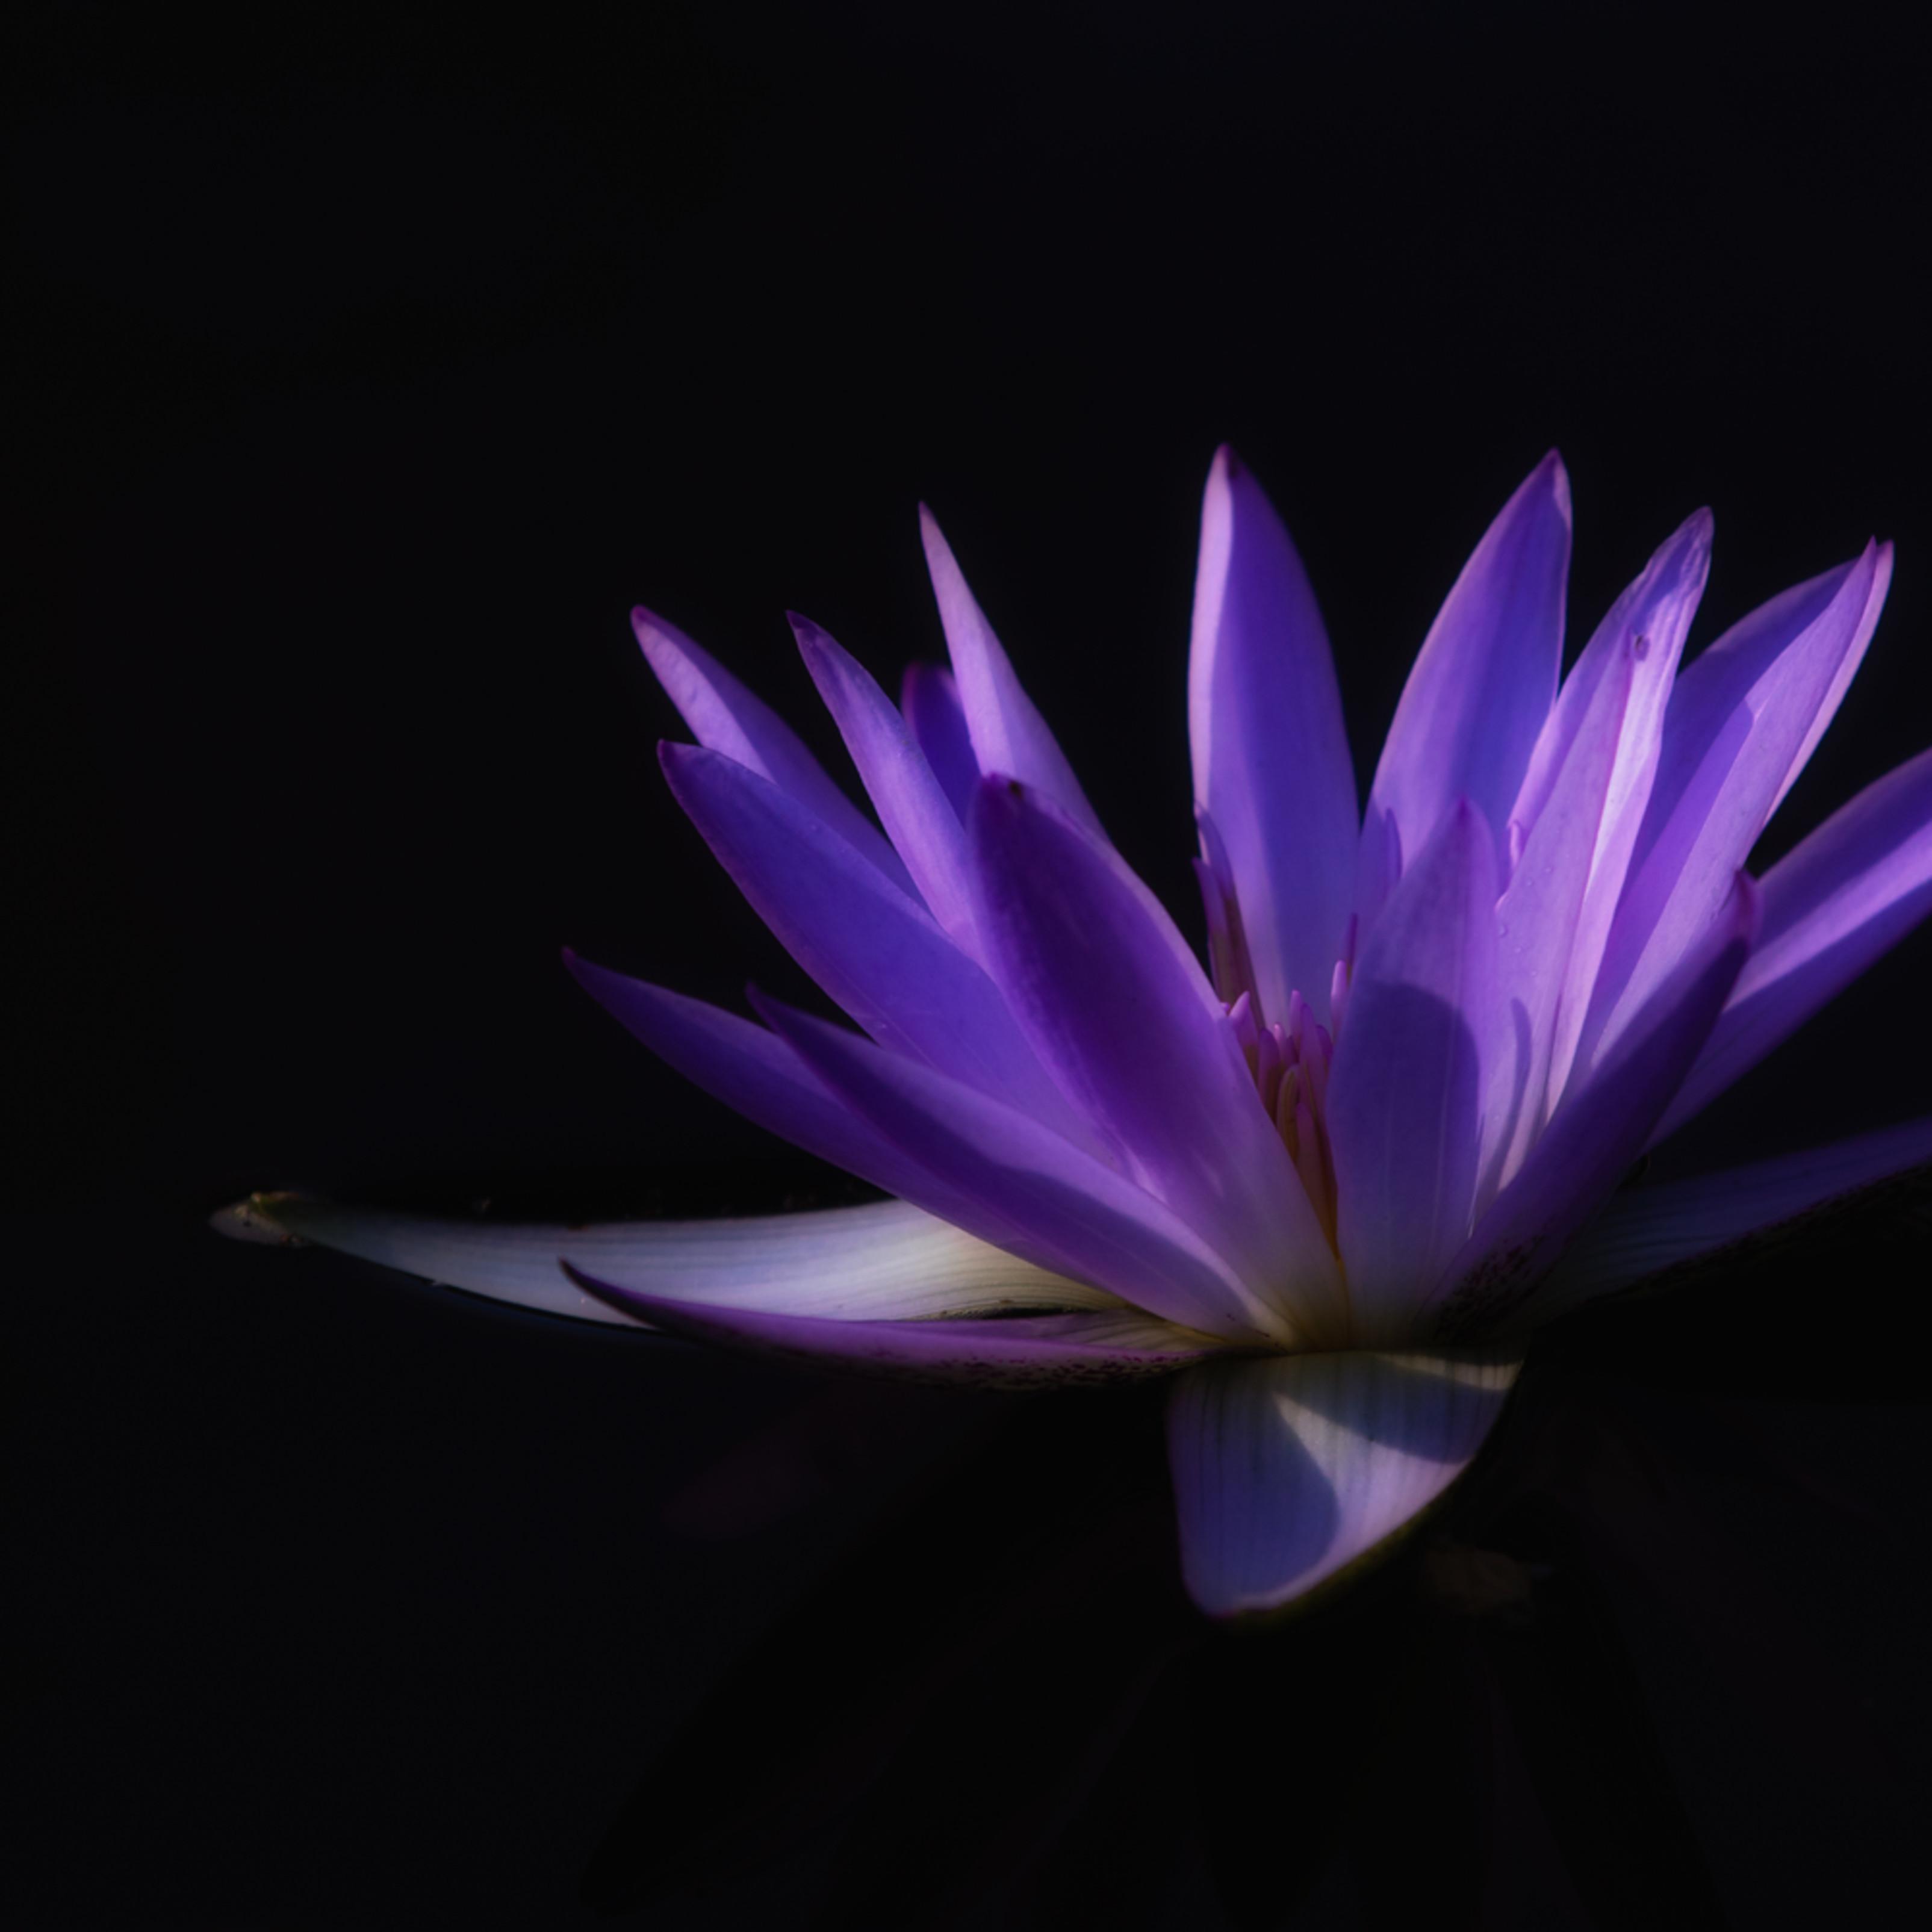 Lavender lily 20151010 092544 mc 018 1 fqy9ru